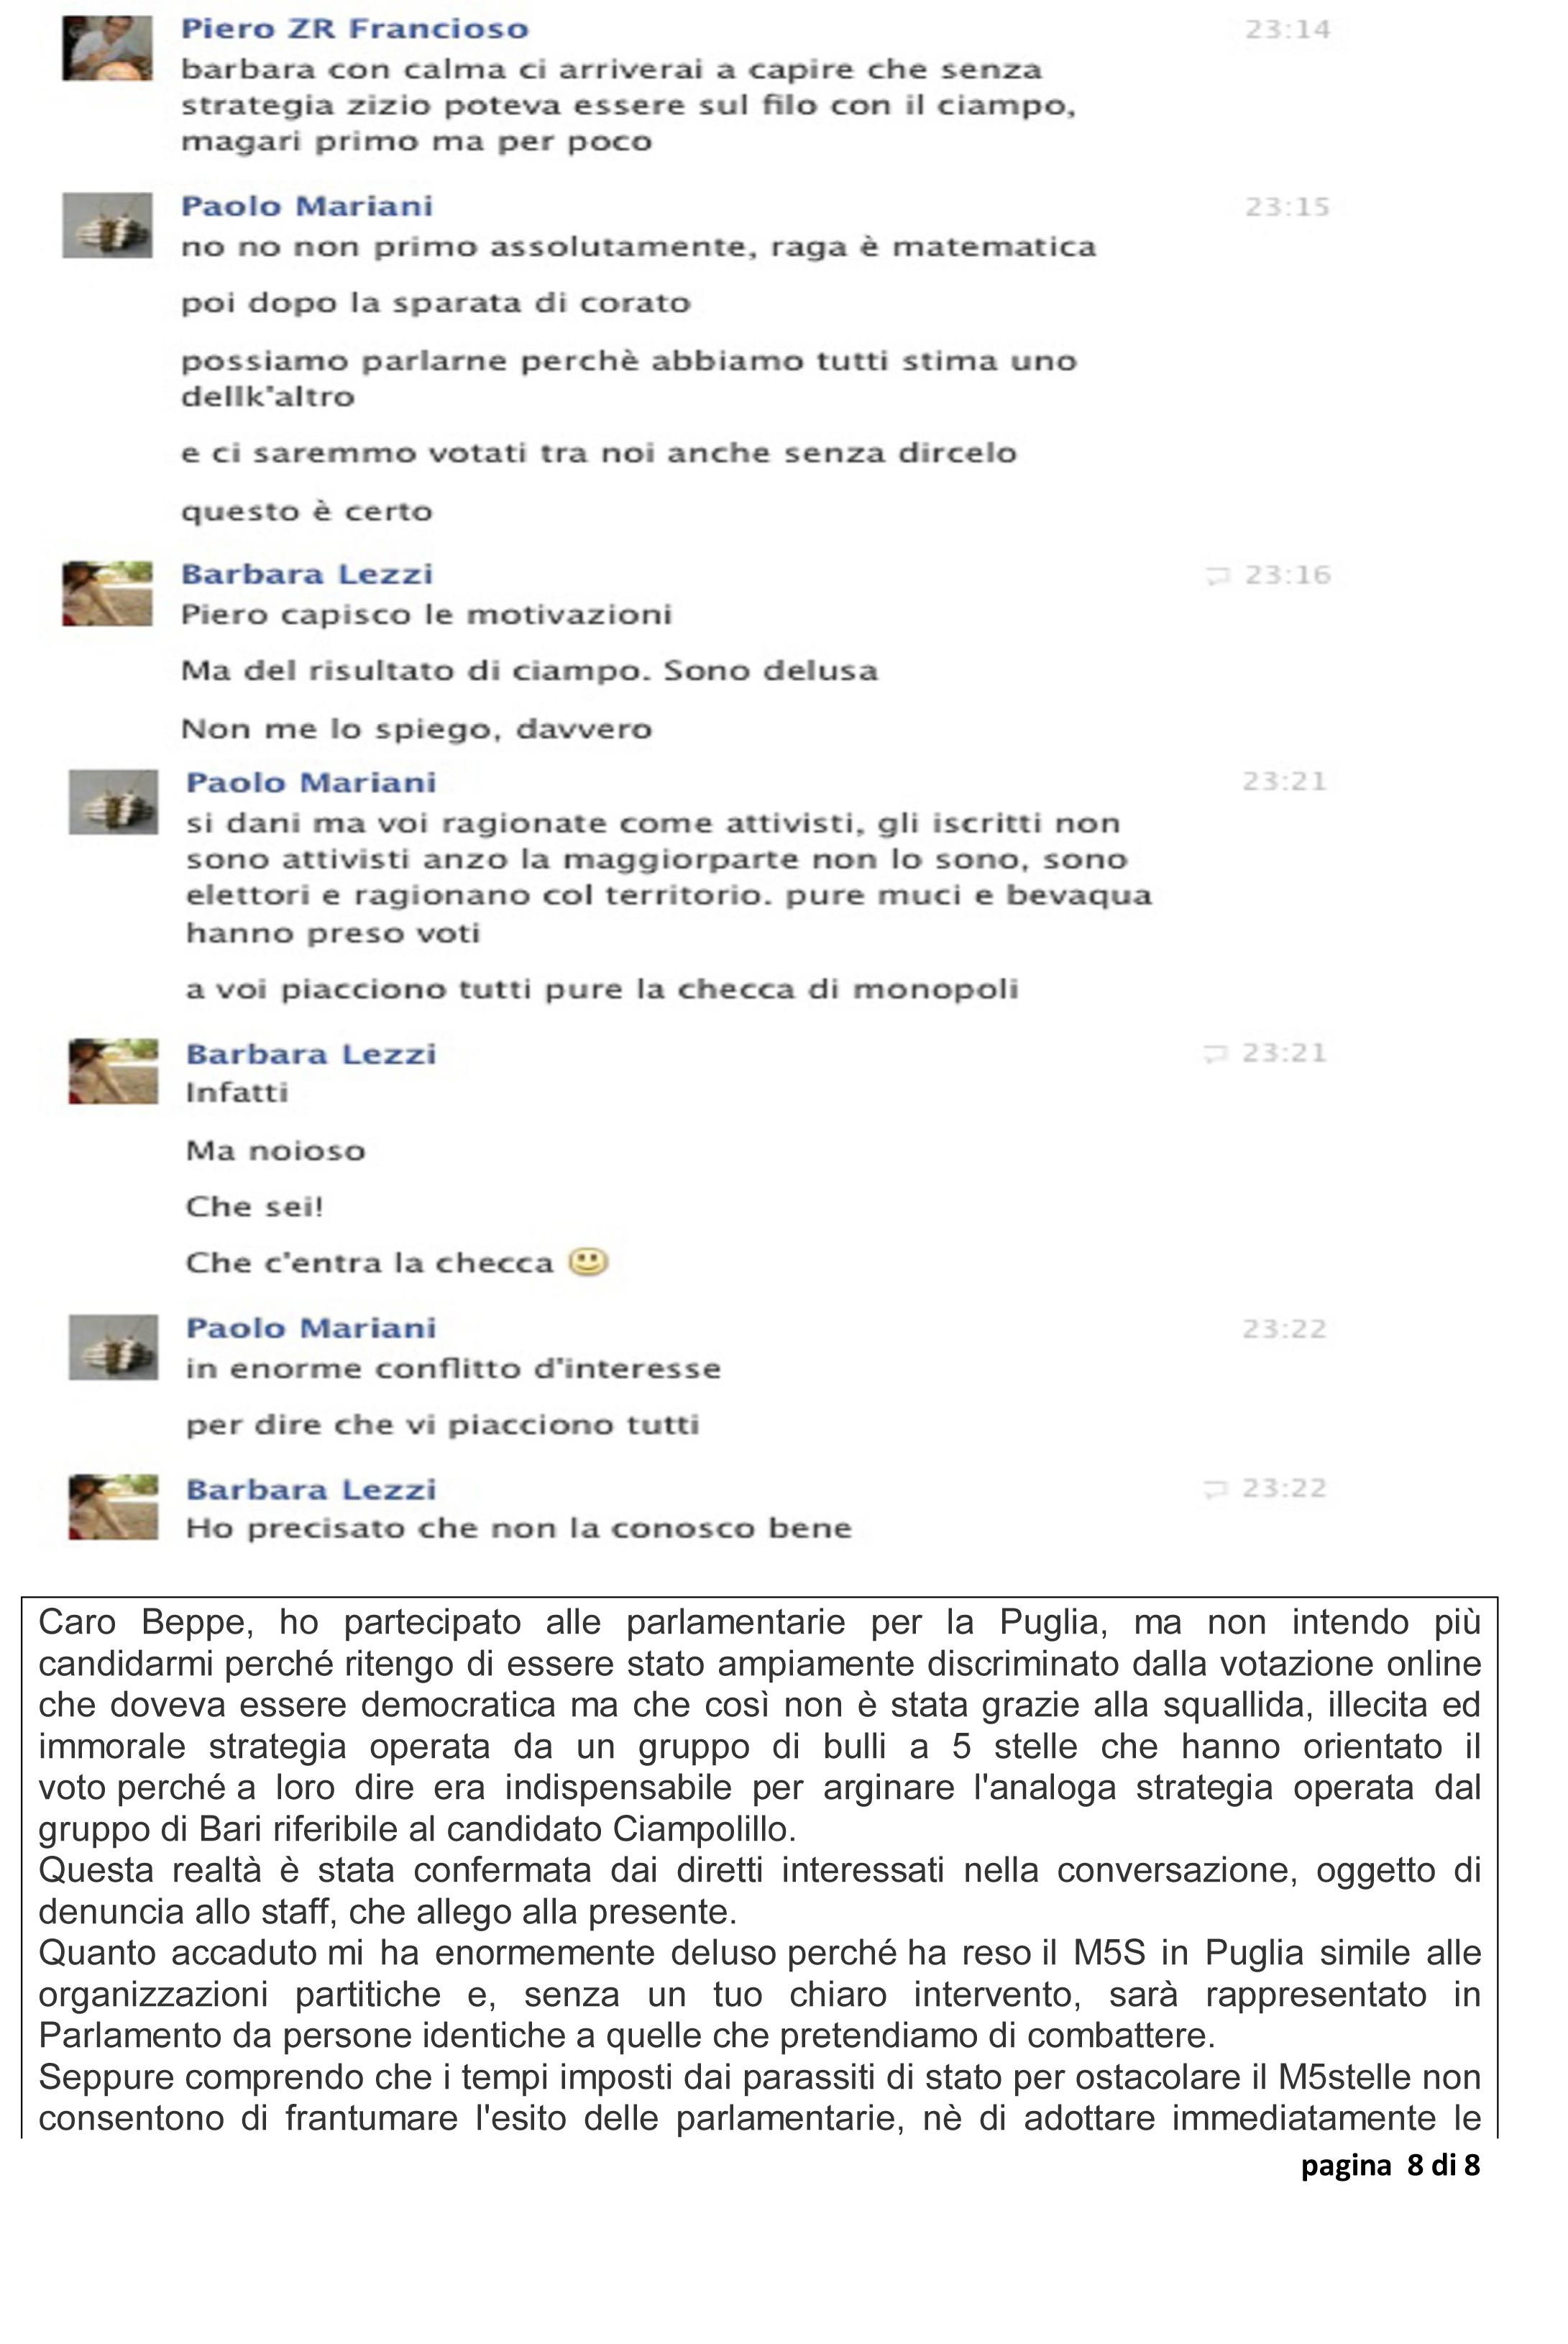 Microsoft Word - RINUNCIA.CANDIDATURA2.doc